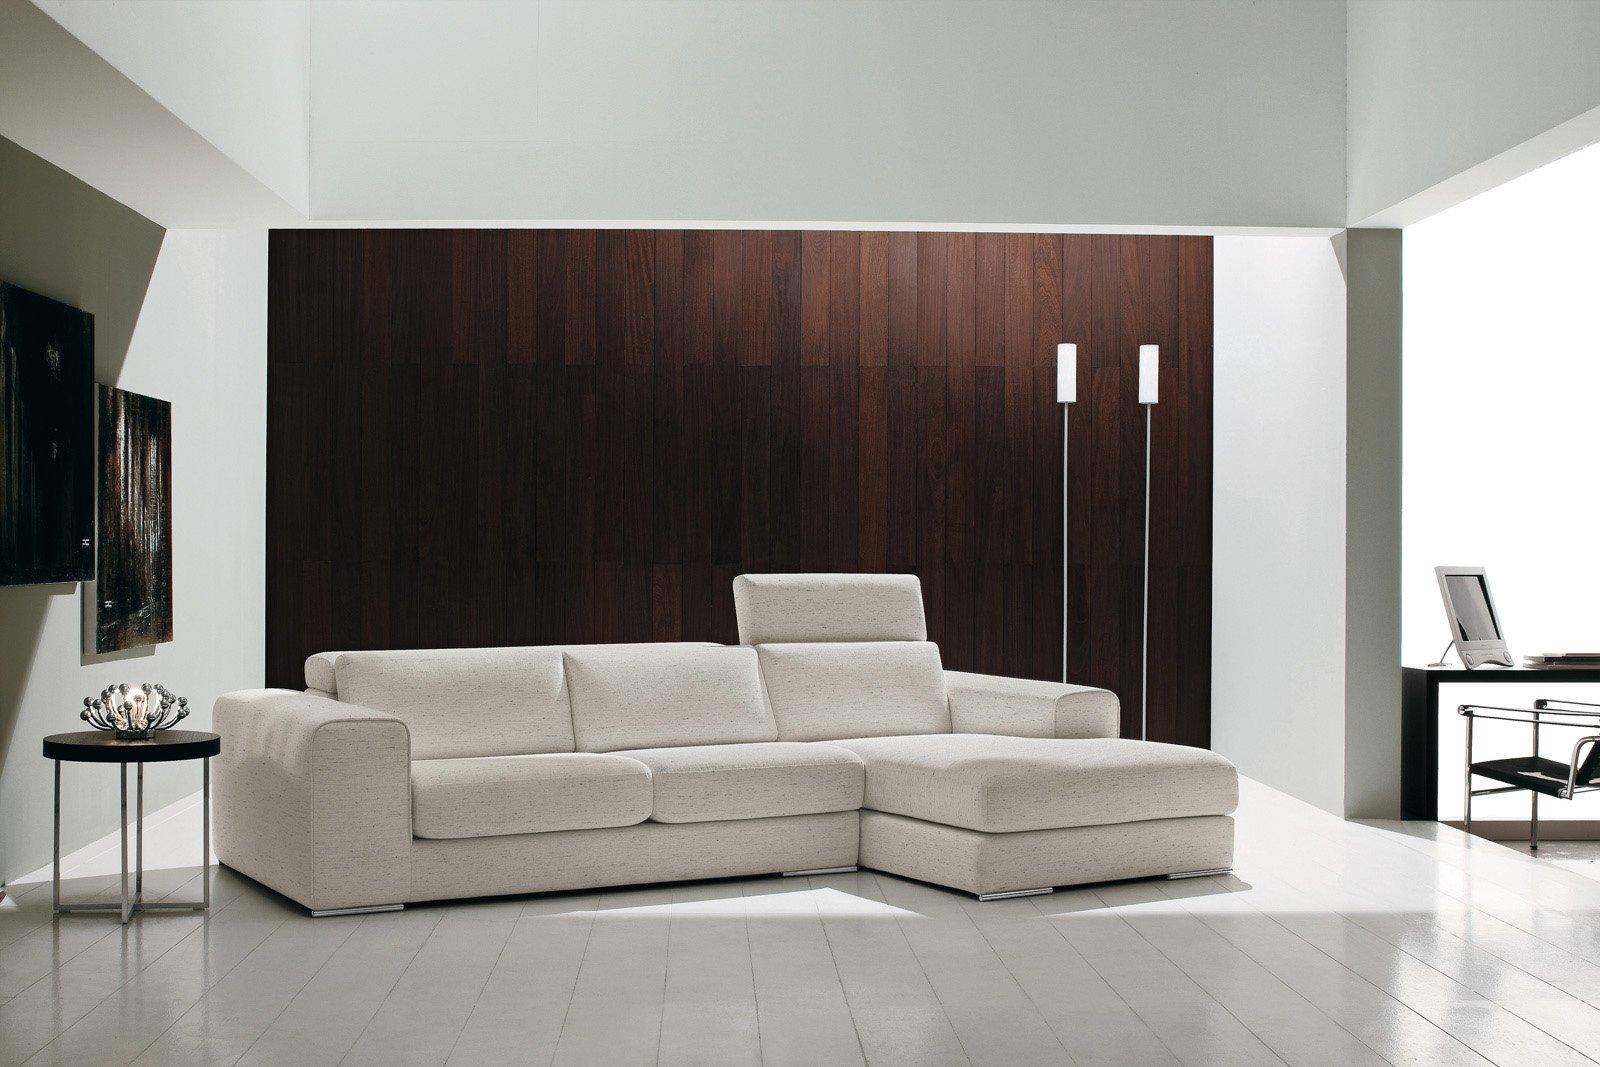 Divani tessuto design: divano sirena senape posti duzzle.